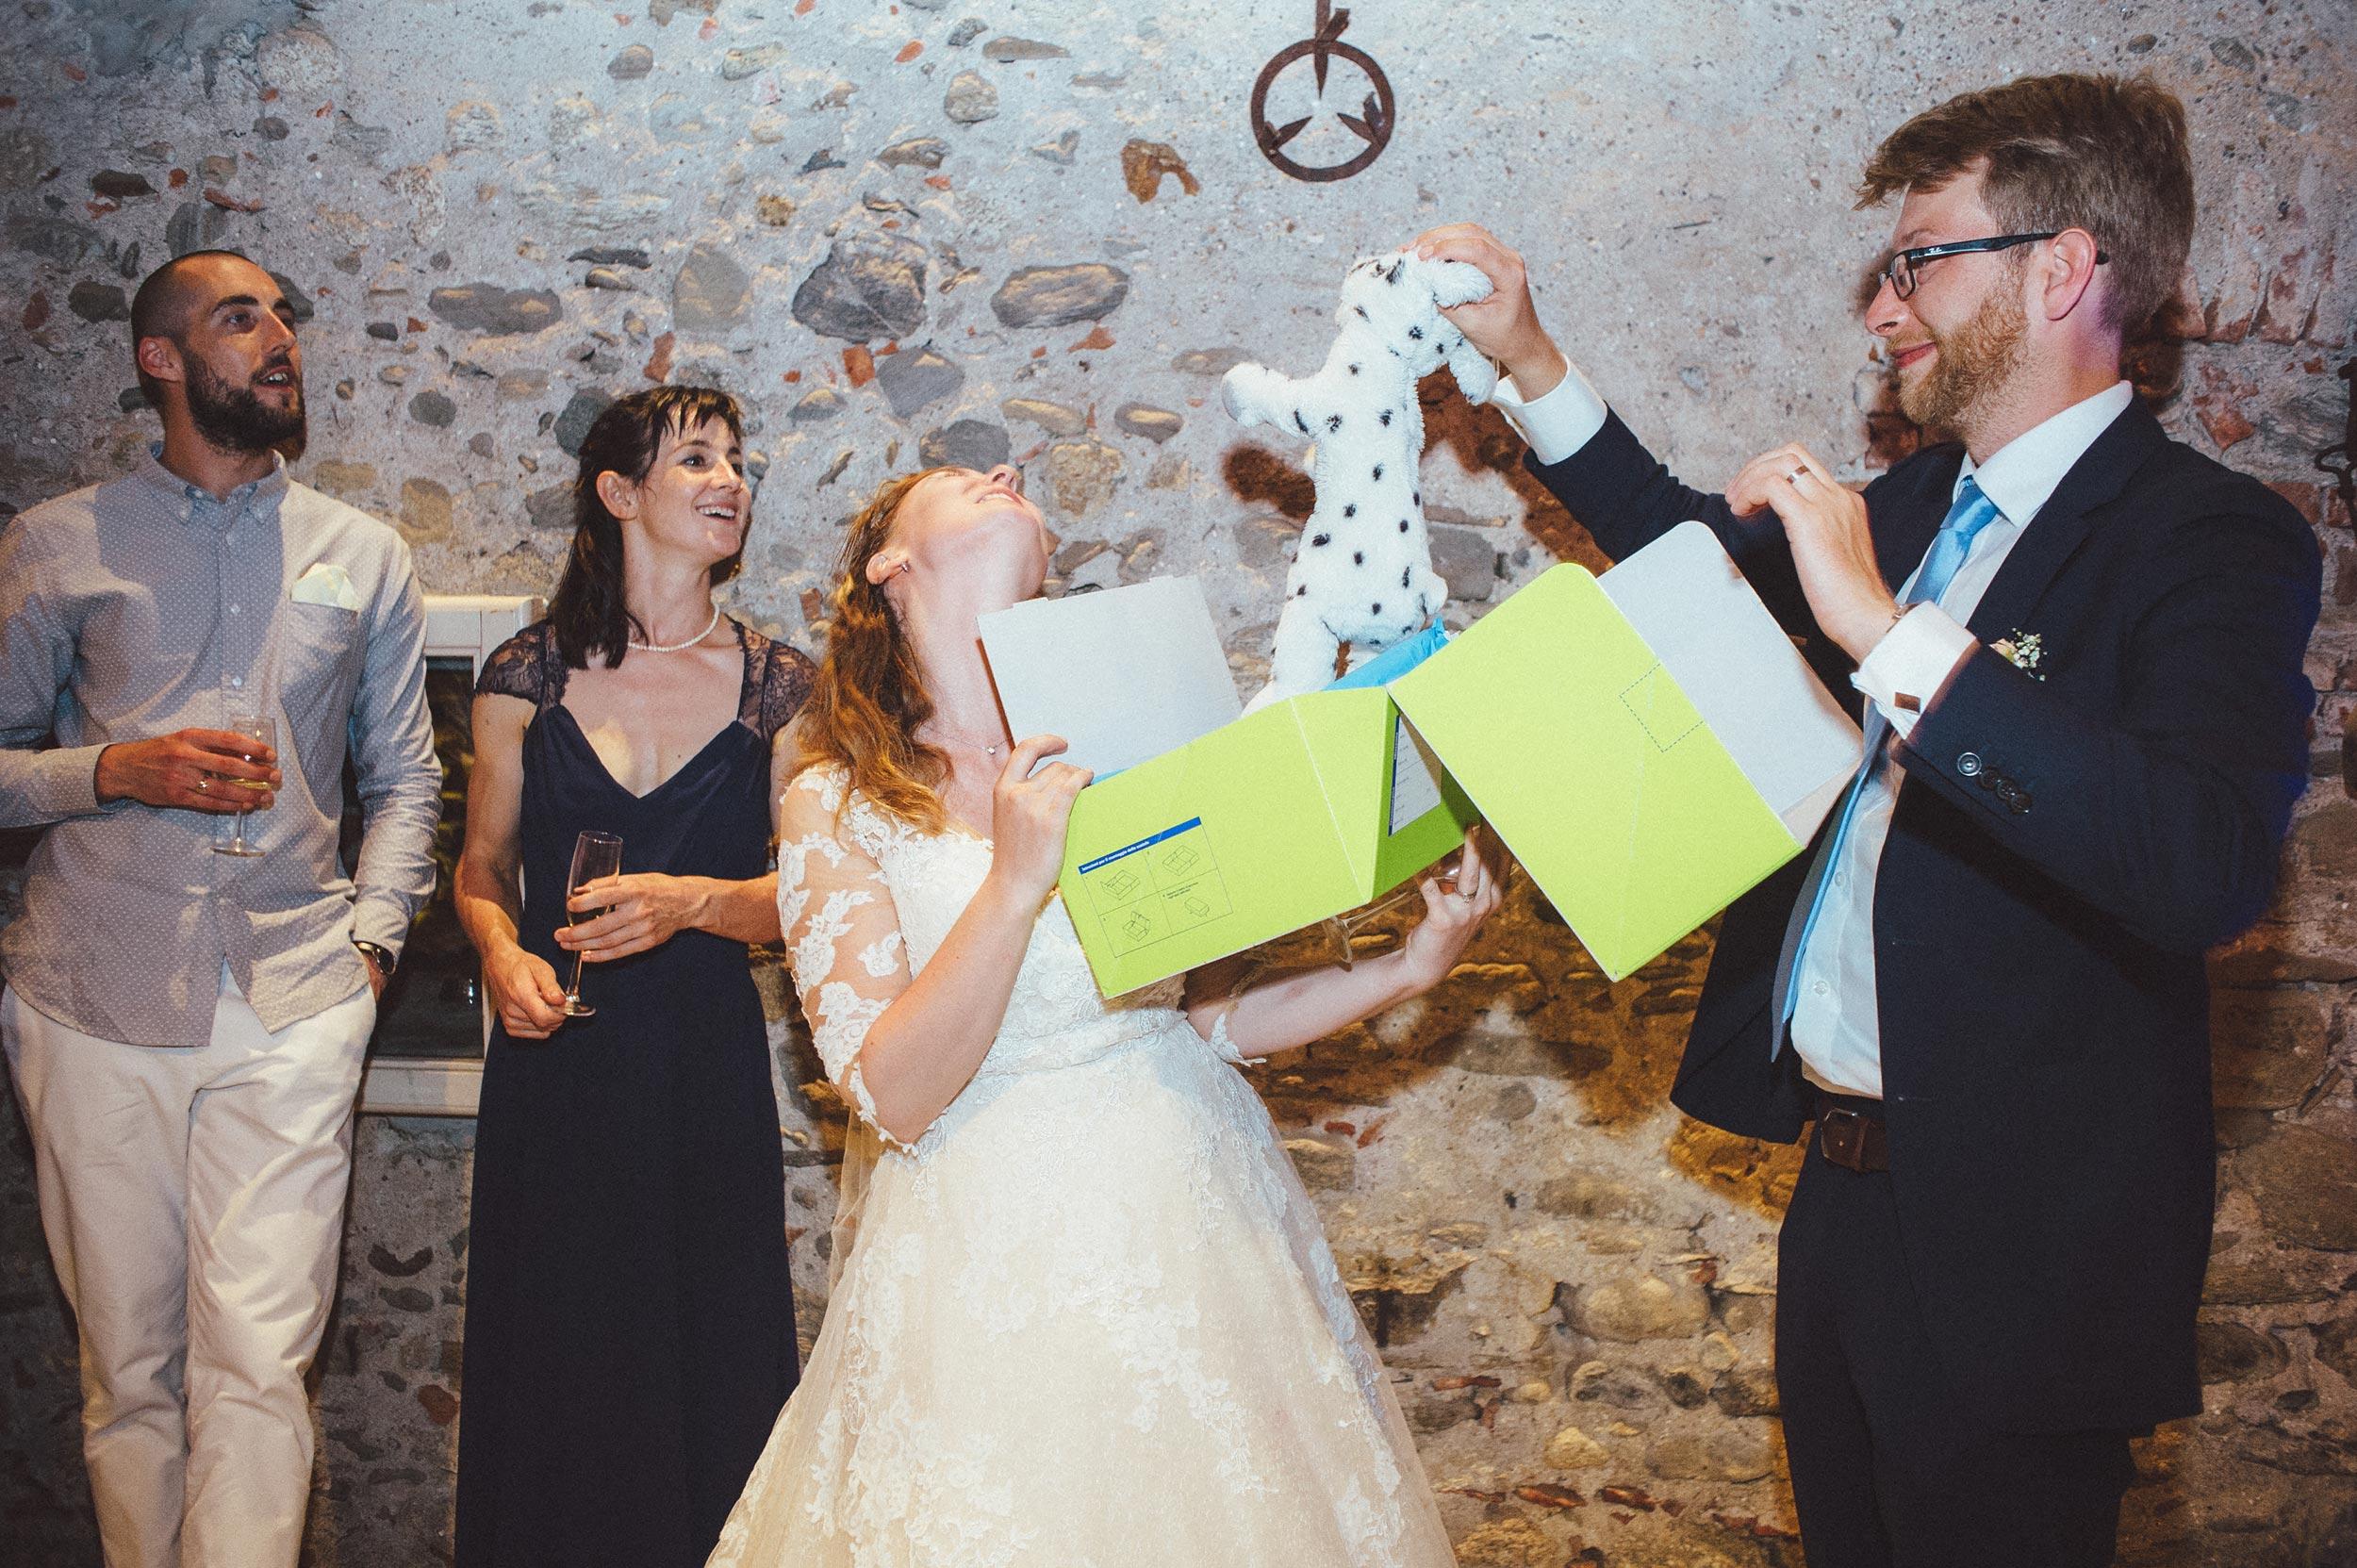 2016-Julius-Silke-Lake-Orta-Wedding-Photographer-Italy-Alessandro-Avenali-117.jpg